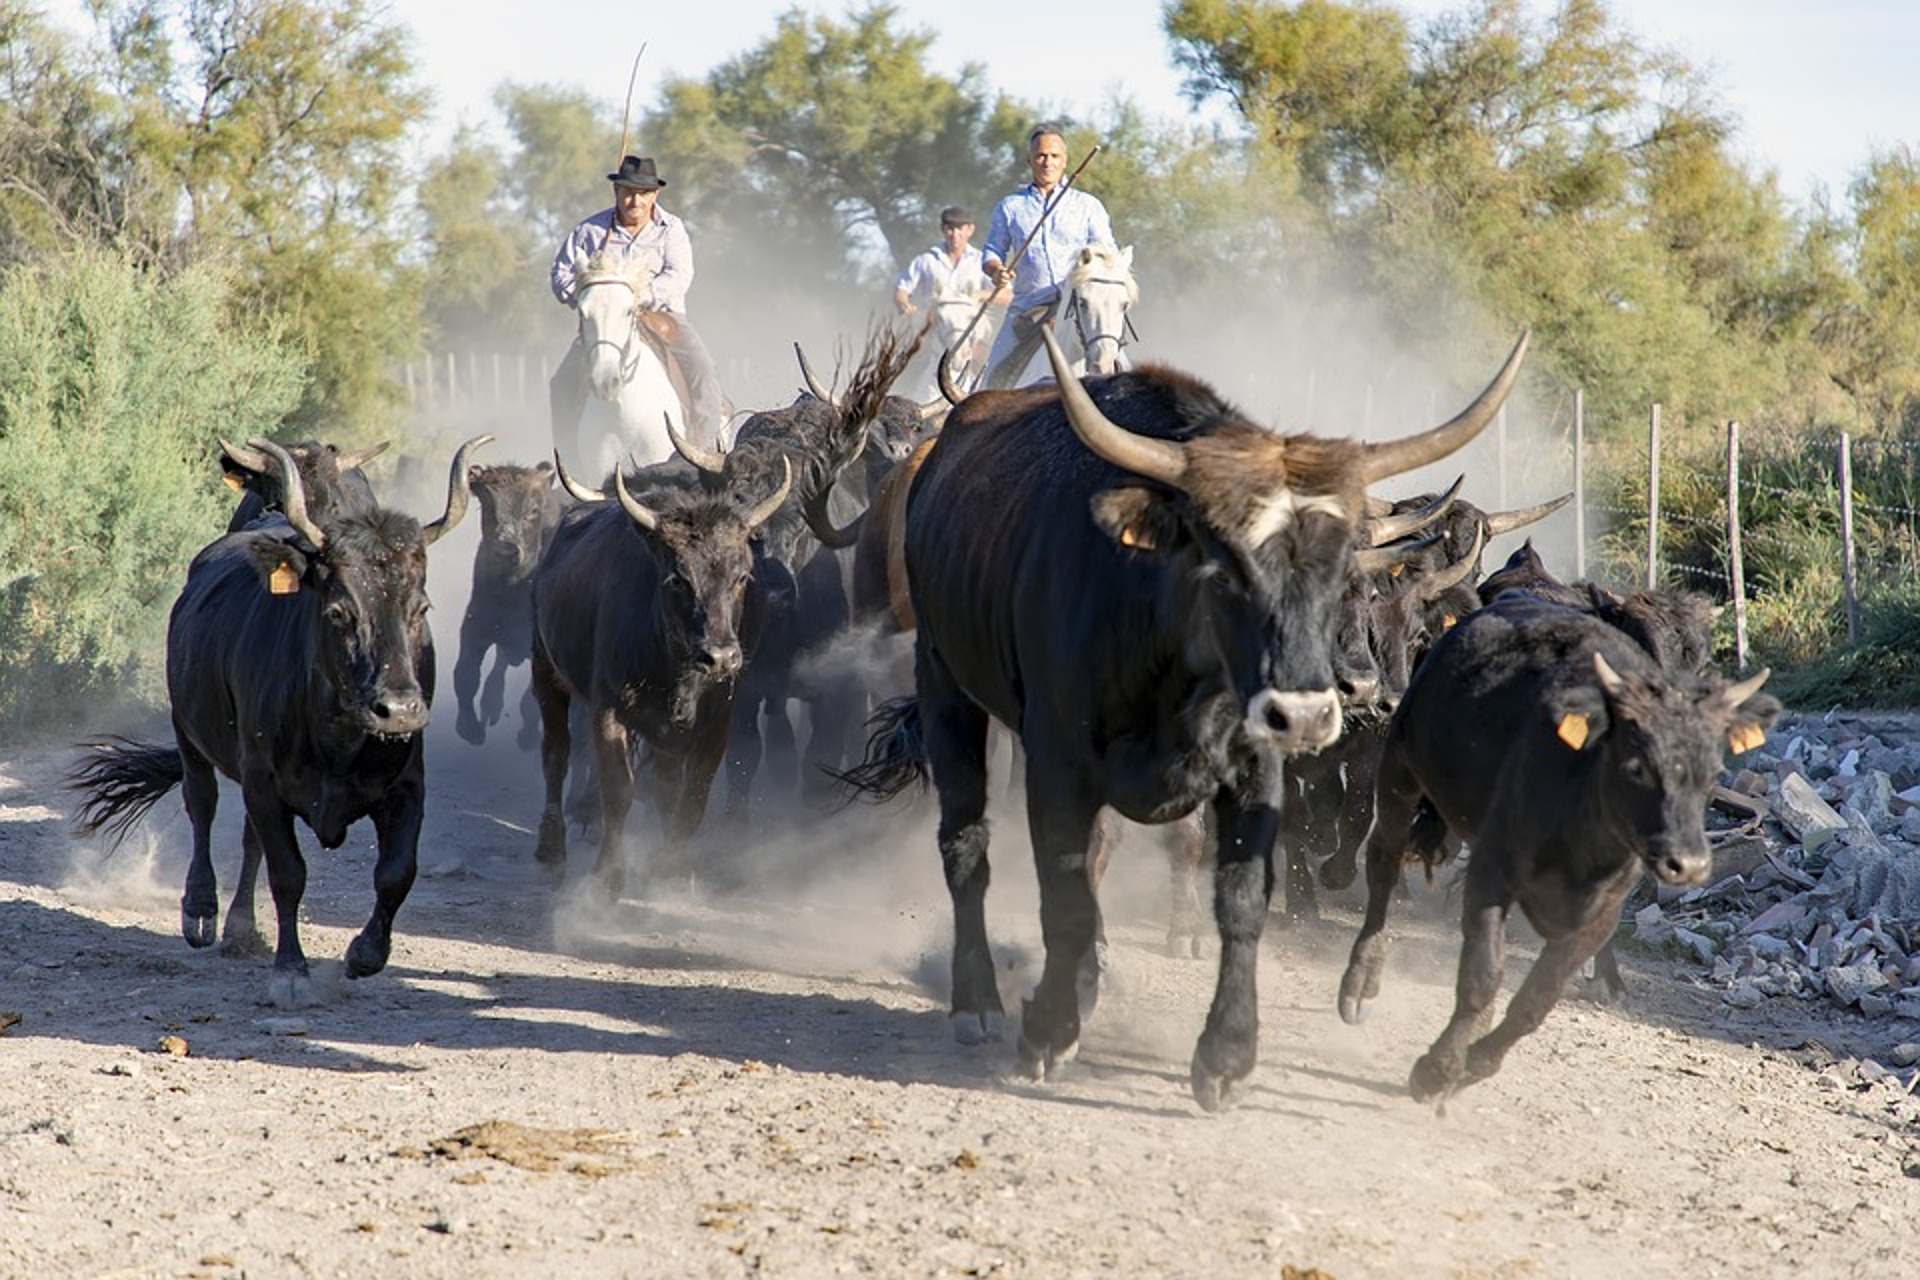 France-gard-uzes-vintage car-2cv-private tour-camargue-herd bull